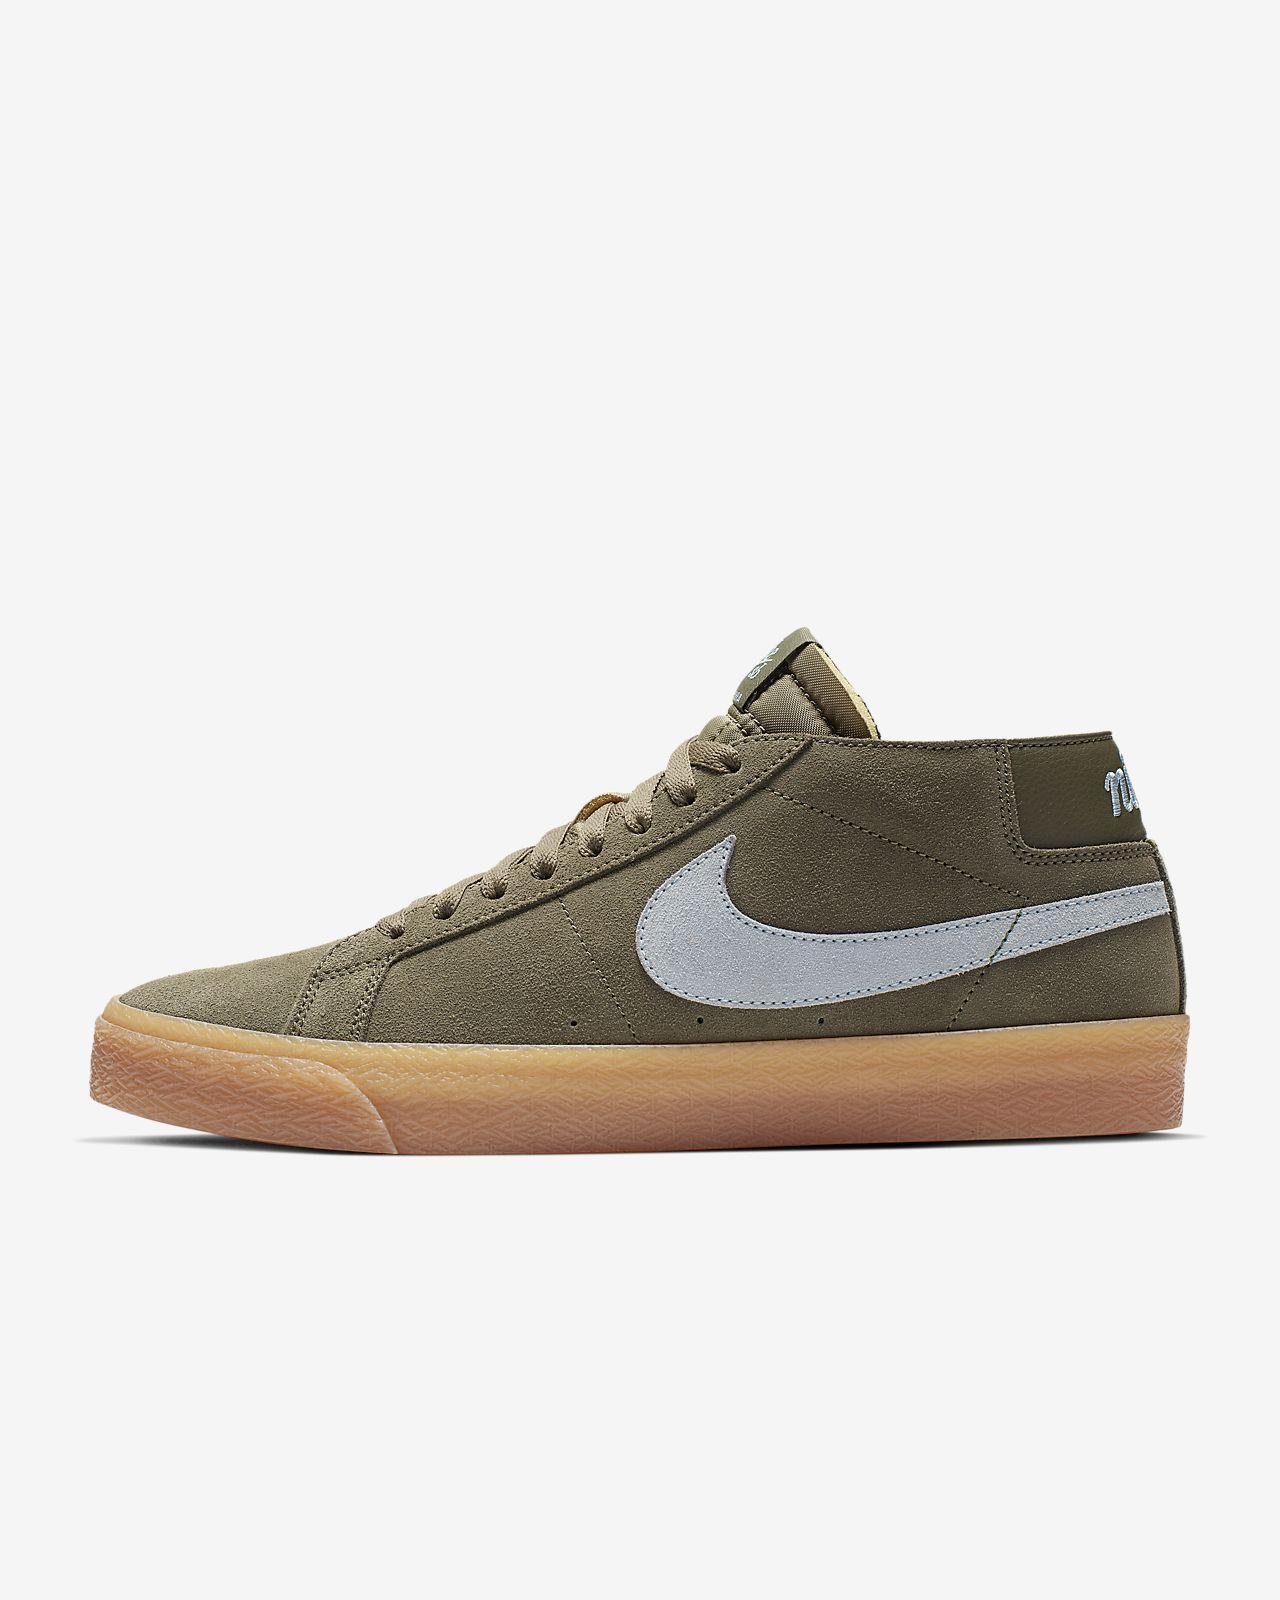 8991f66ef9 Nike SB Zoom Blazer Chukka Men's Skate Shoe